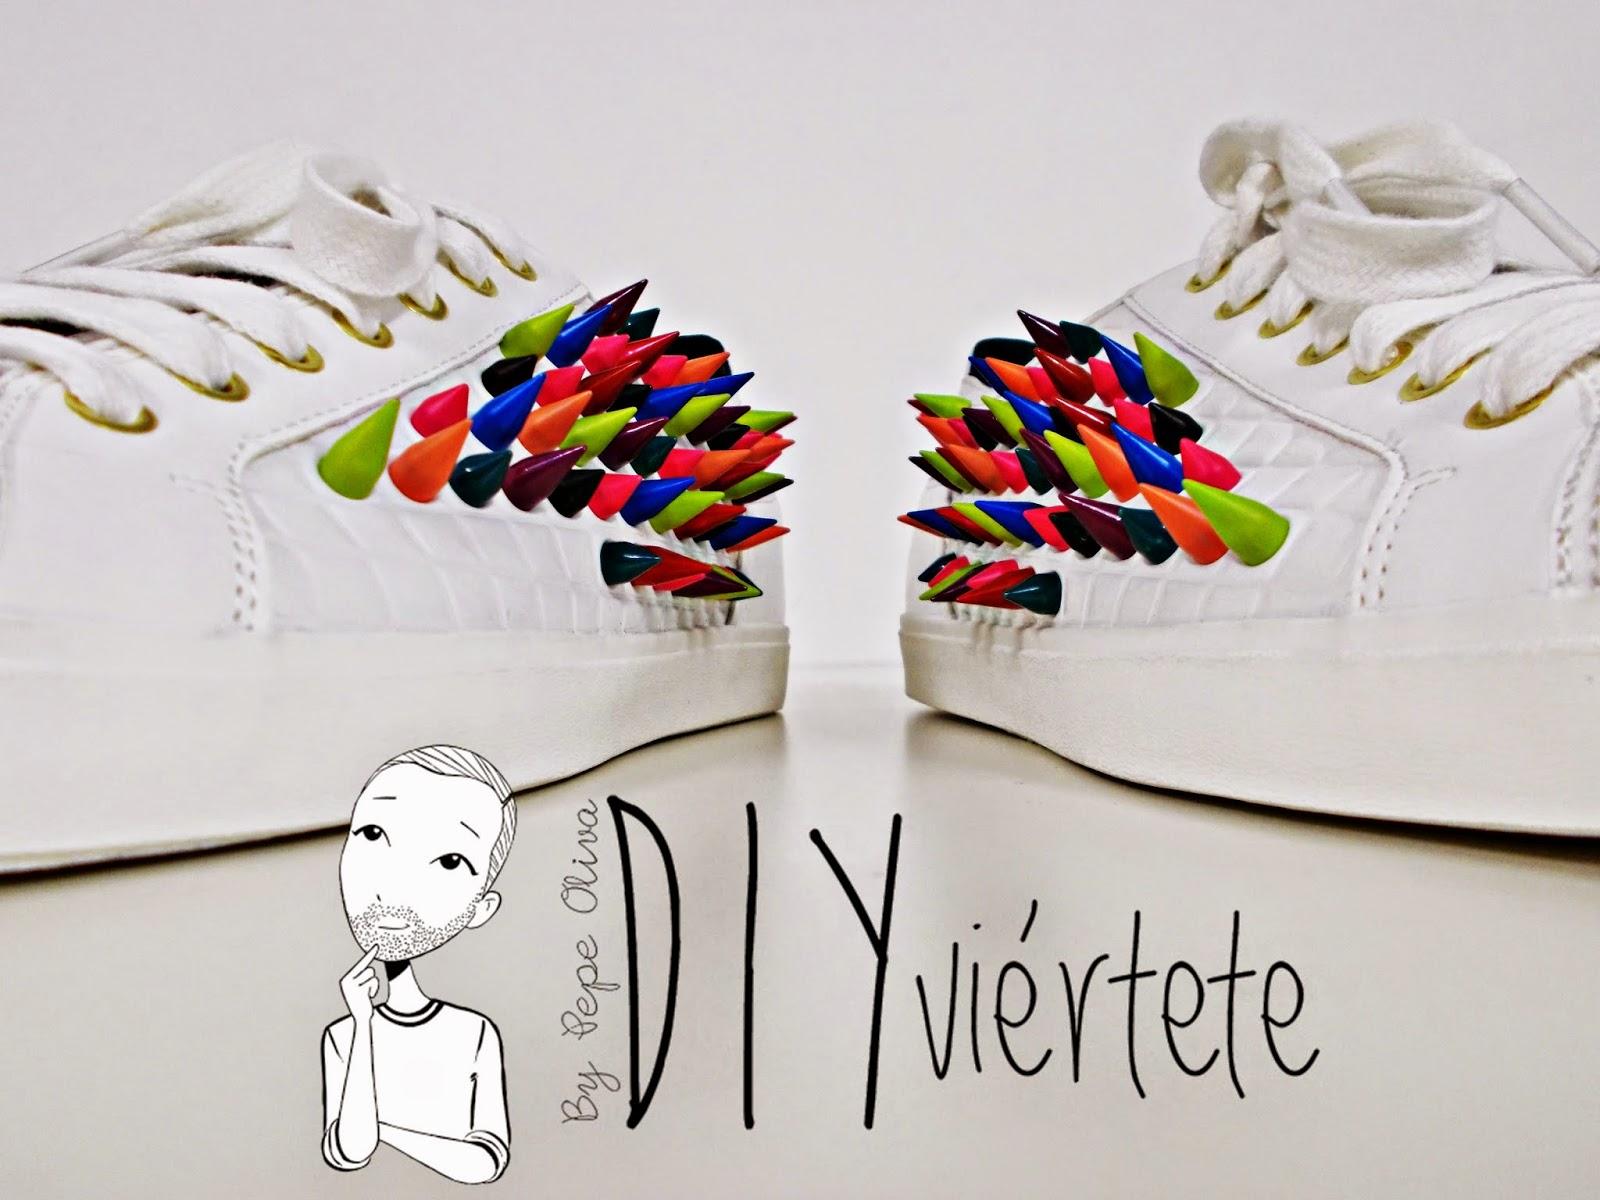 DIY-zapatillas-tunear-customizar-CHRISTIAN-LOUBOUTIN-zapatos-pinchos-esmaltes-pinta uñas-colores-13